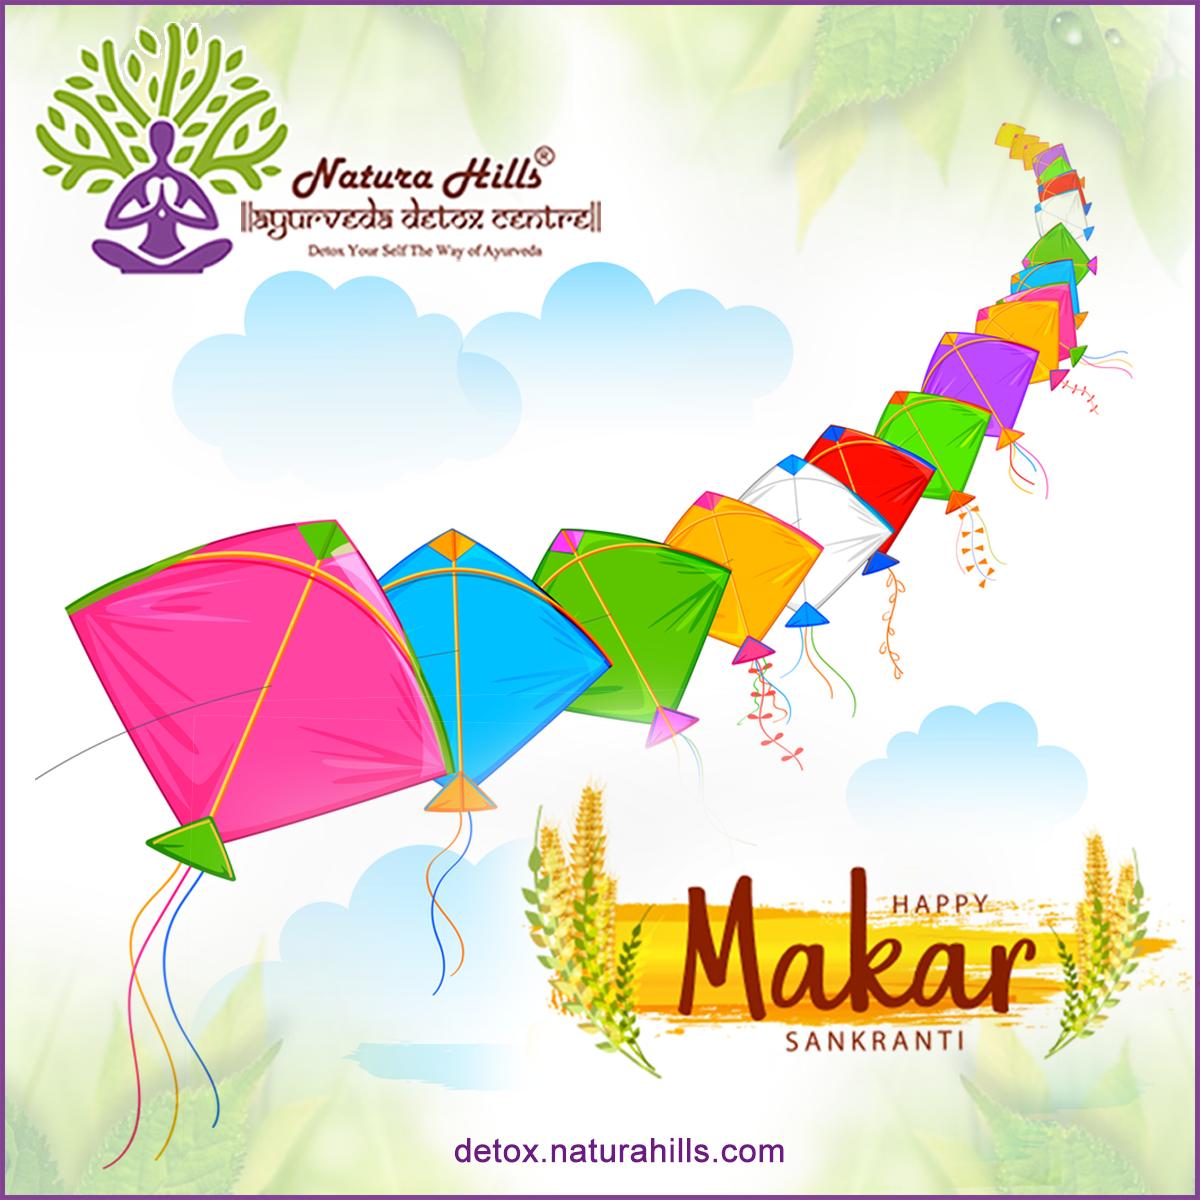 May this Makar Sankranti bring you Joy and Happiness and Burn all your moments of Sadness.  NaturaH